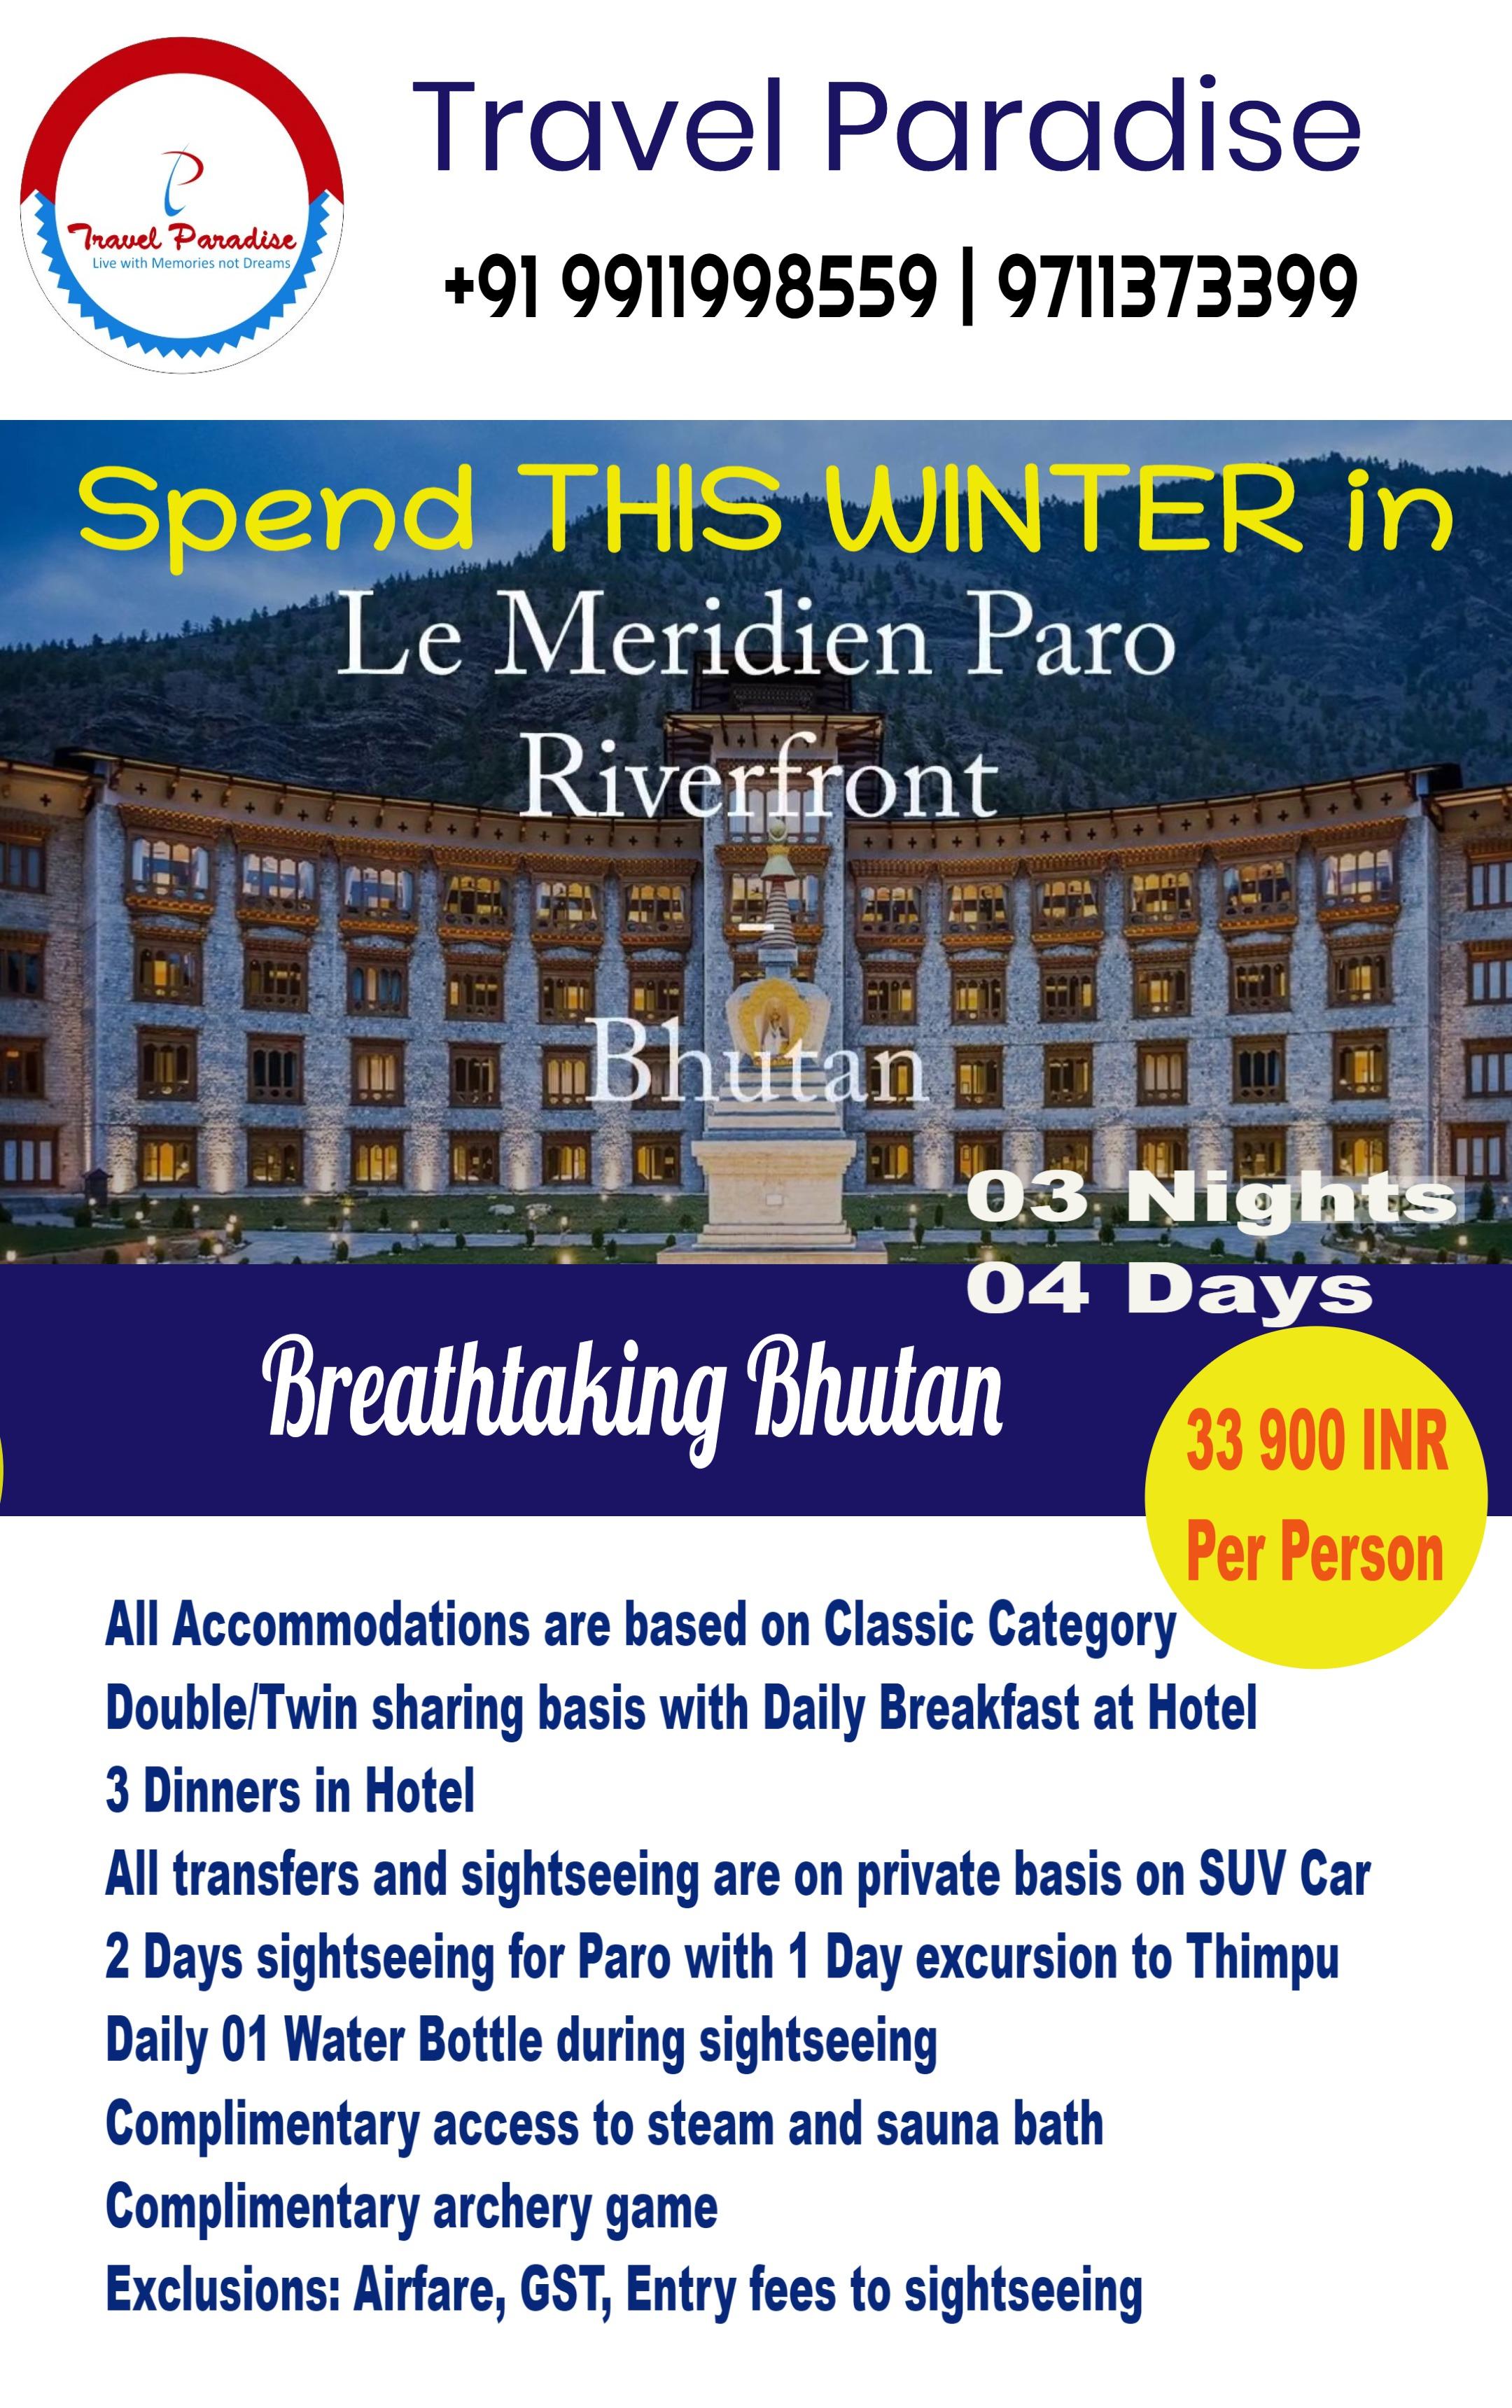 Breathtaking Bhutan (wv)